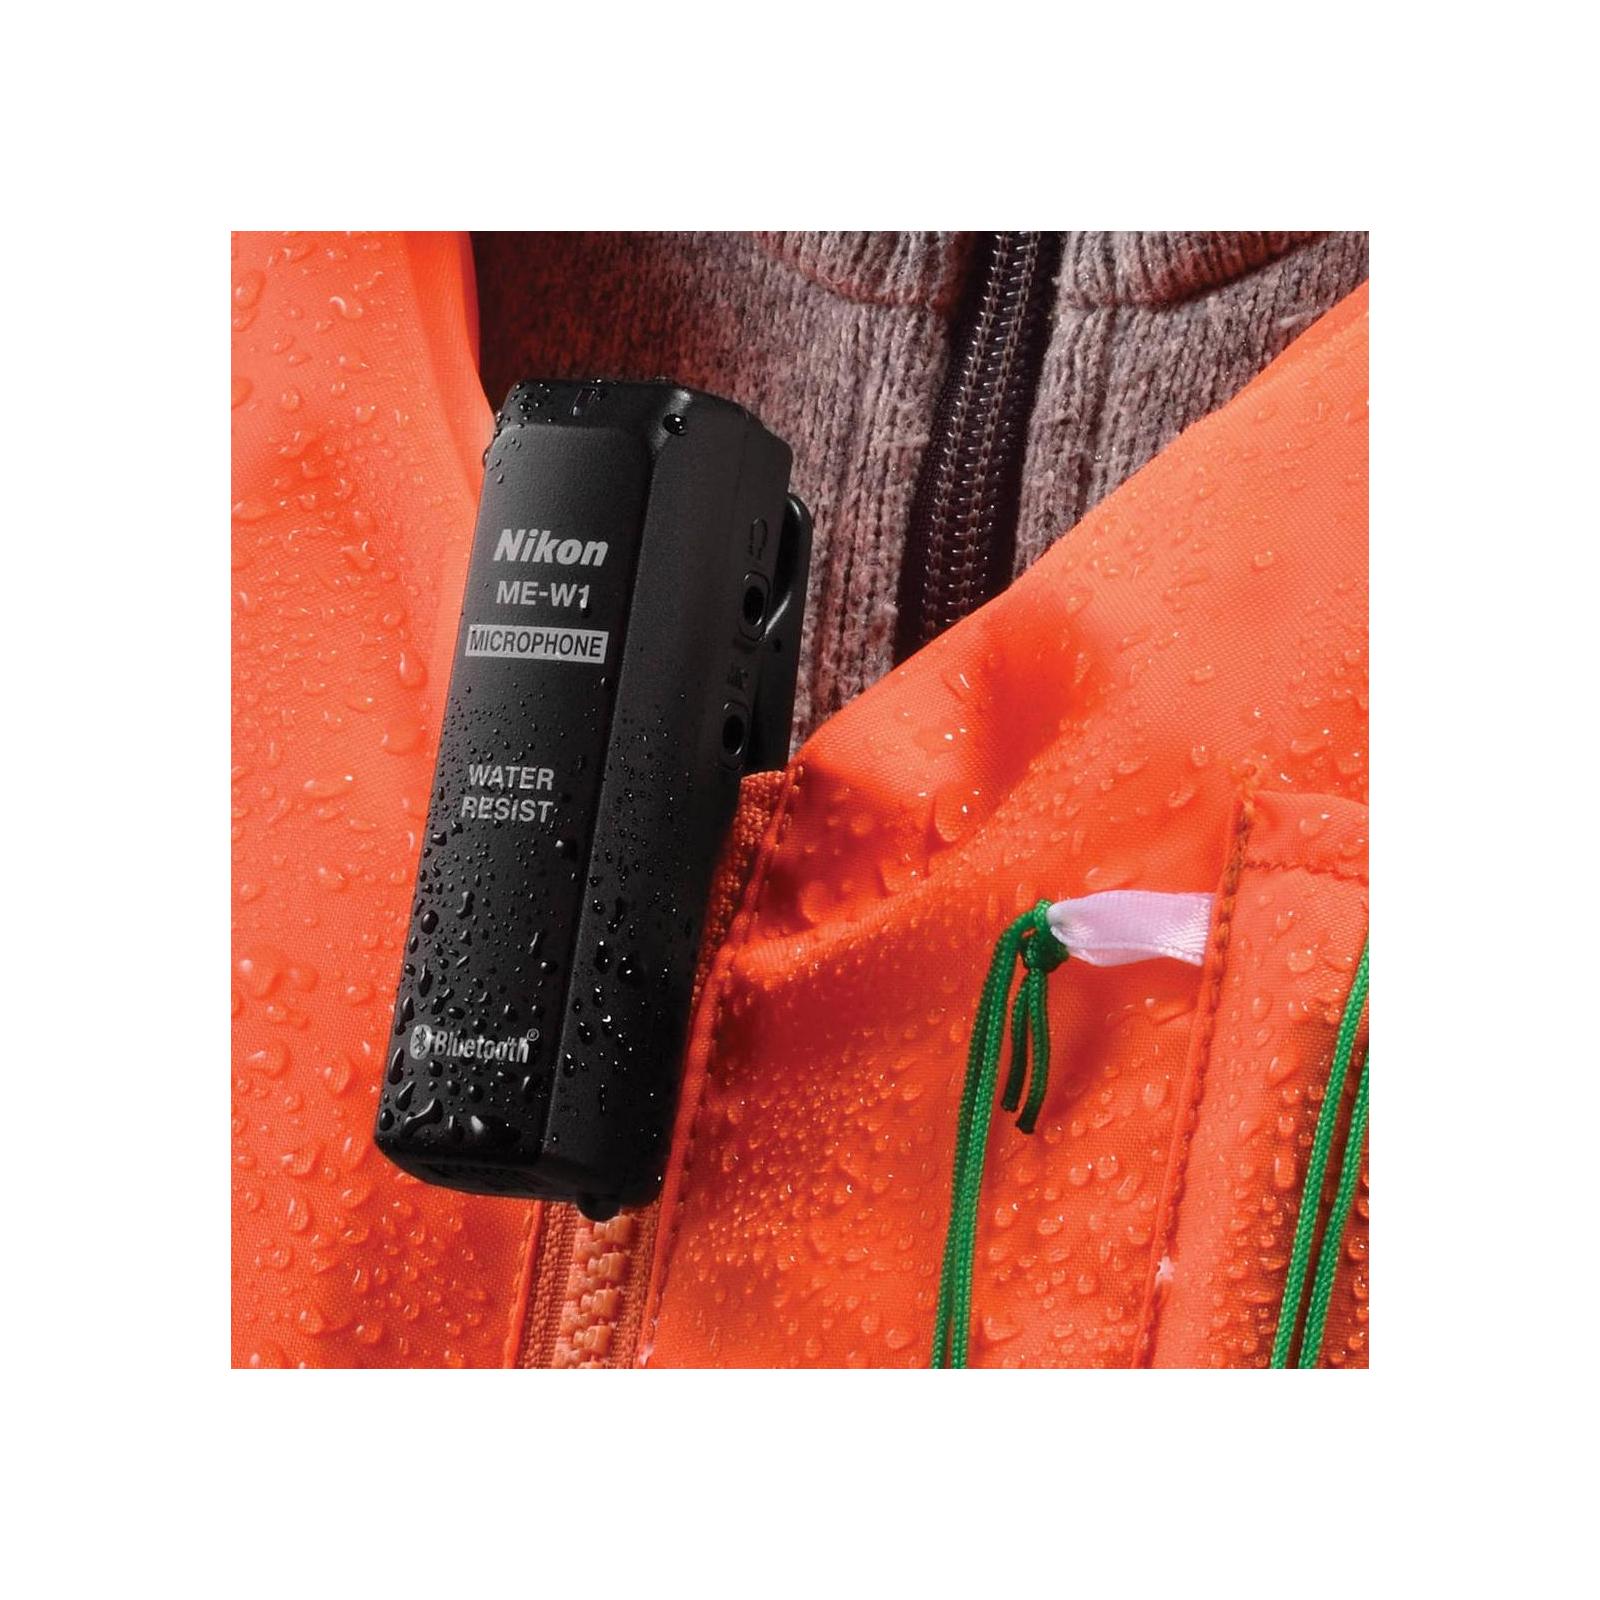 Микрофон Nikon ME-W1 Wireless Microphone (VWA105AE) изображение 2